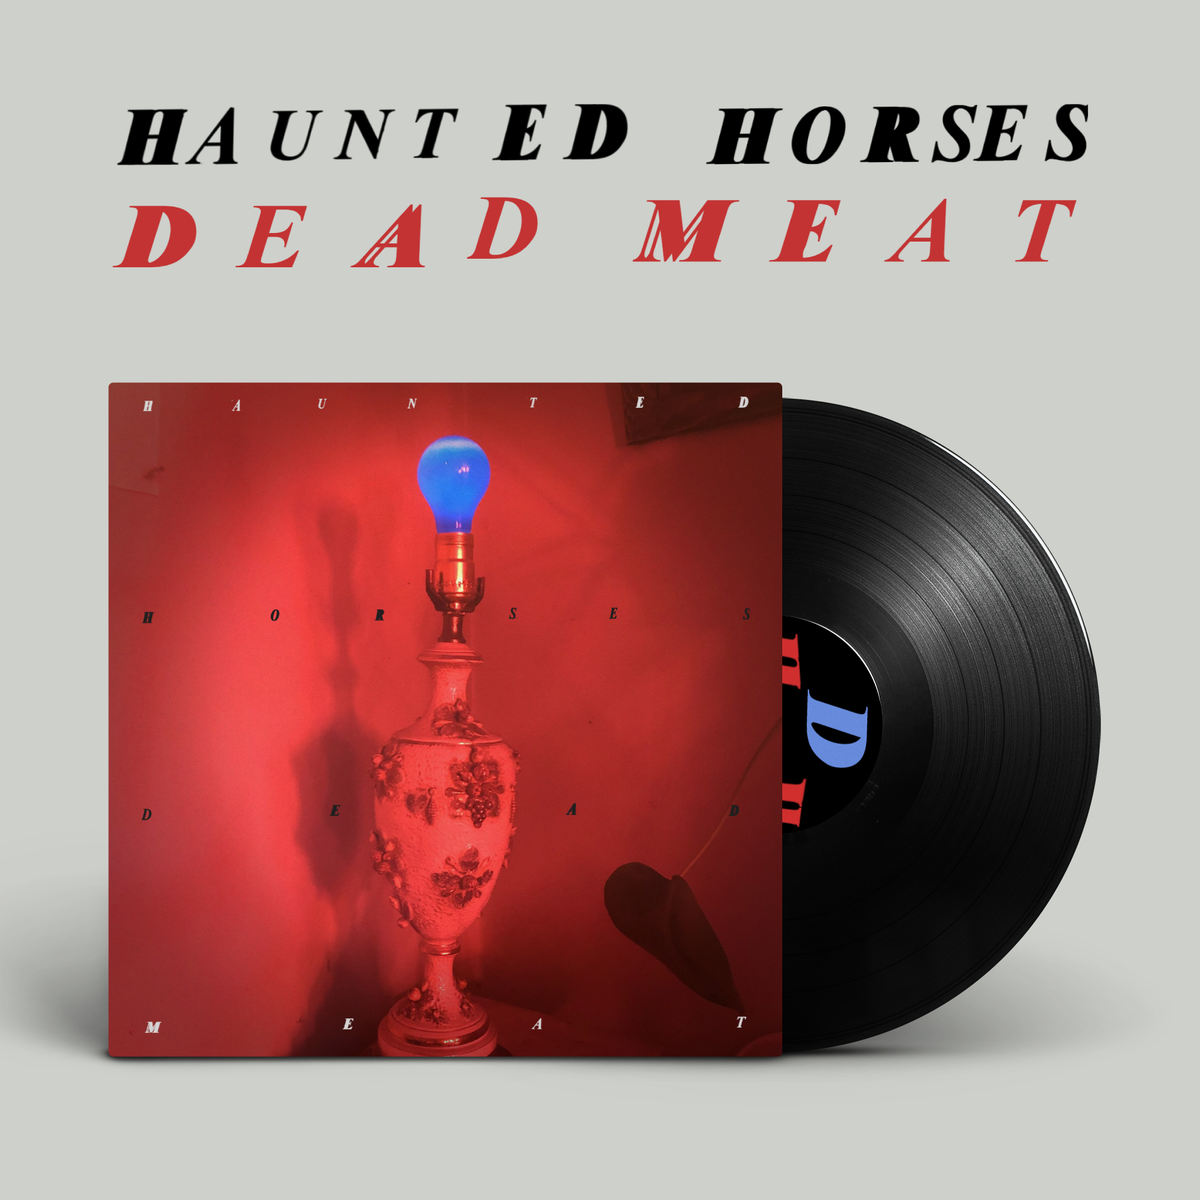 "Image of Haunted Horses - Dead Meat LP (12"" Vinyl)"